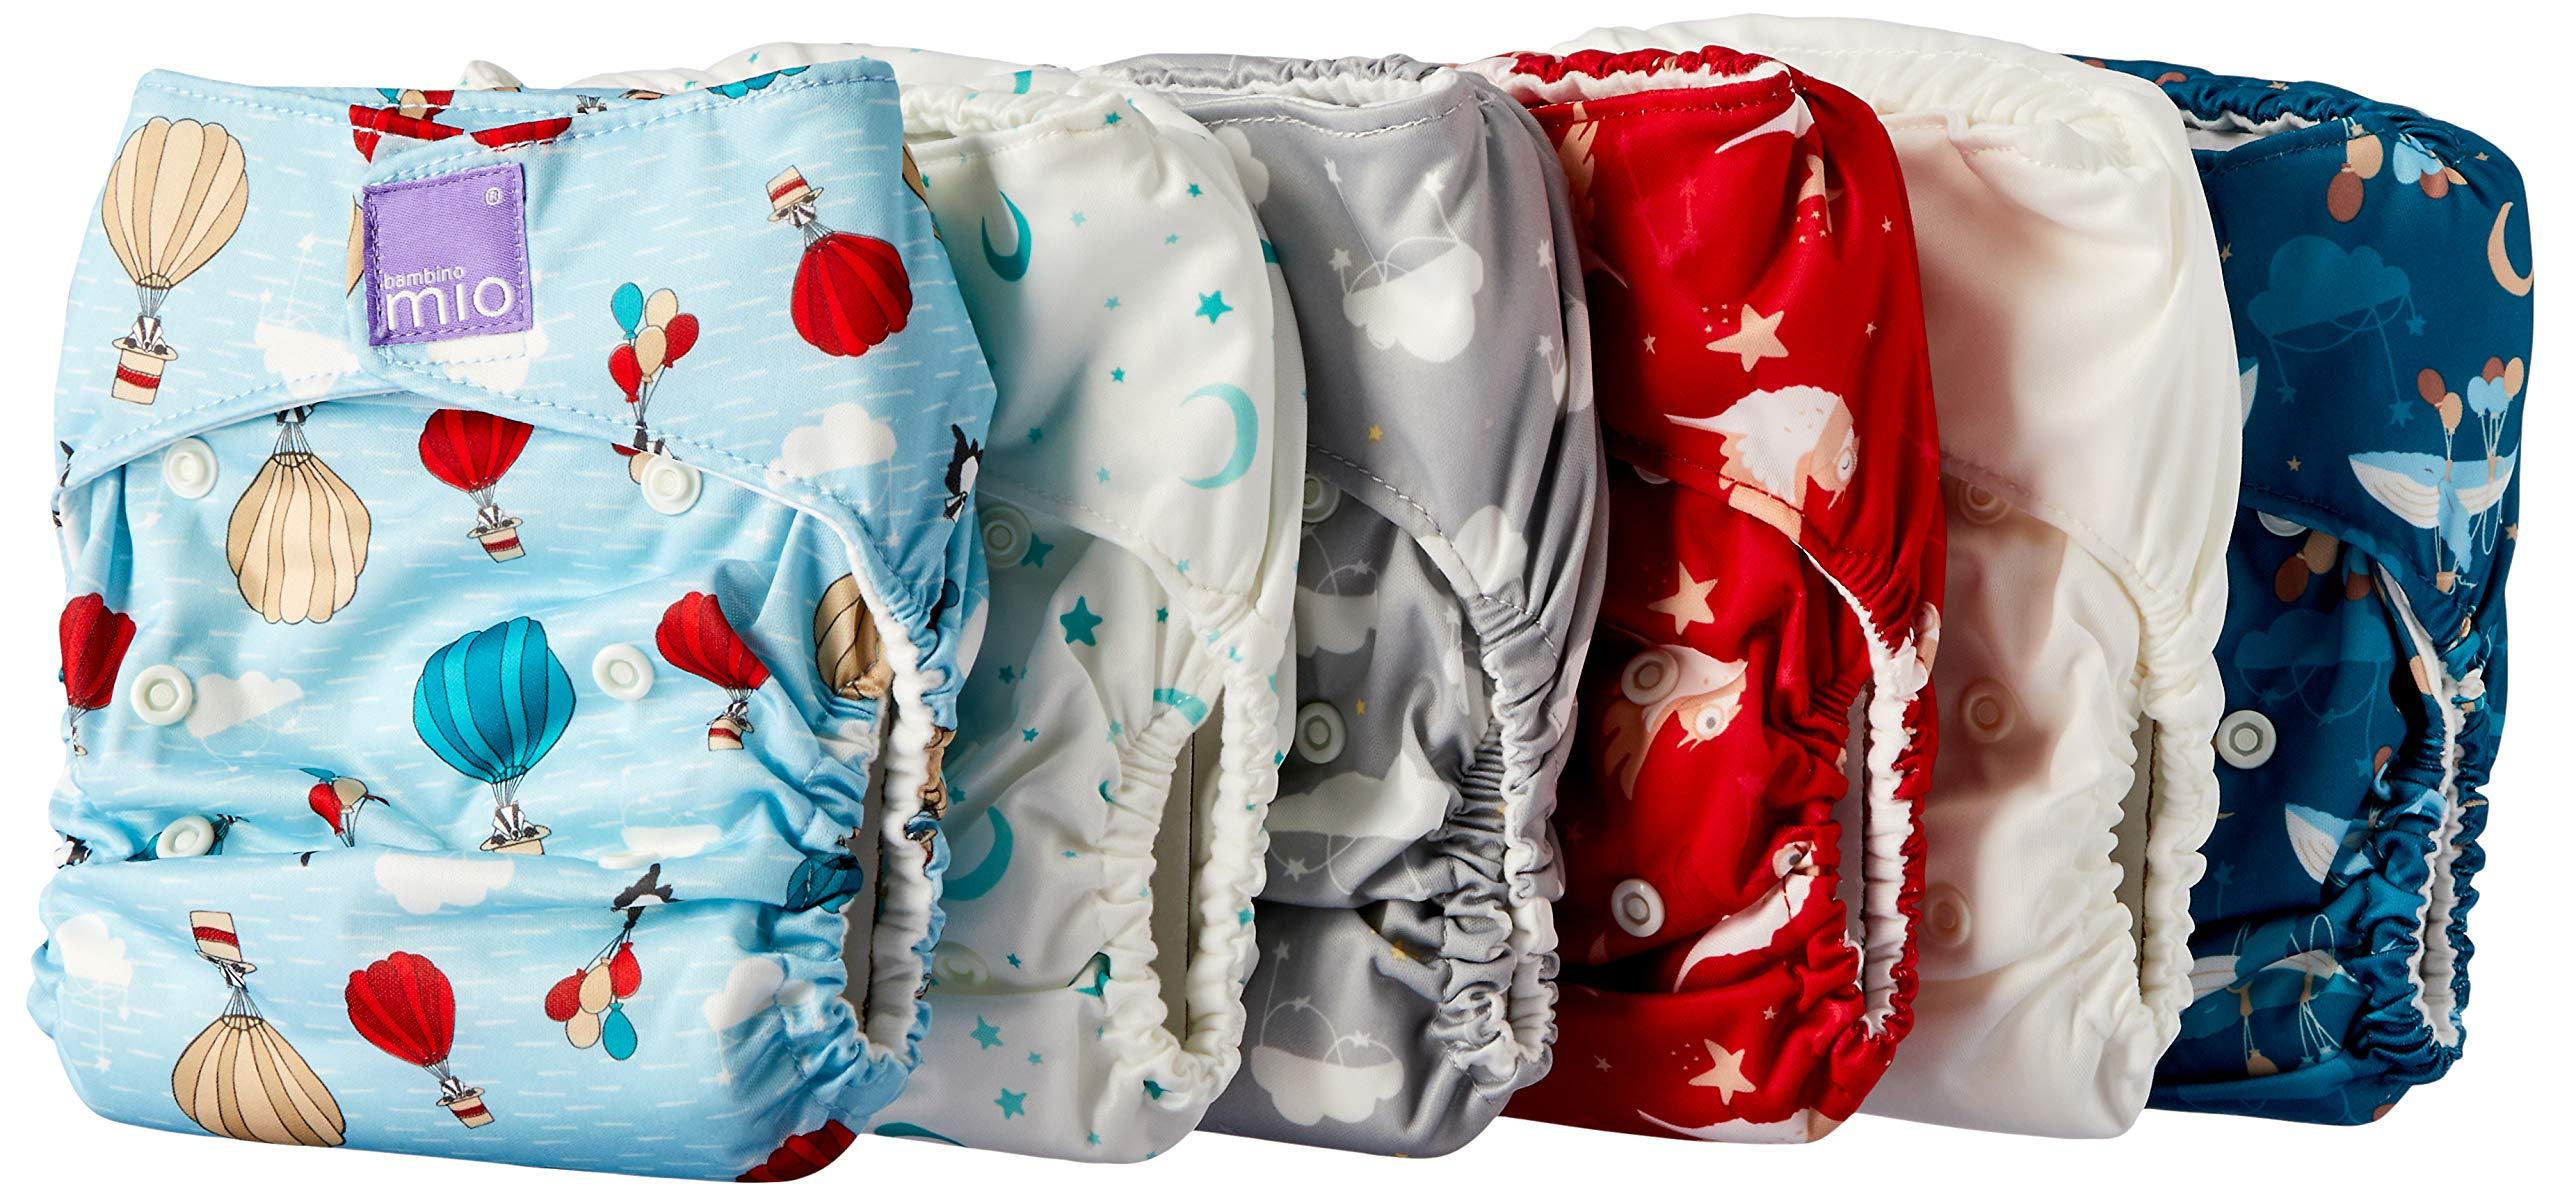 Bambino Mio, Miosolo Cloth Diaper Set, OneSize, Dream Traveler